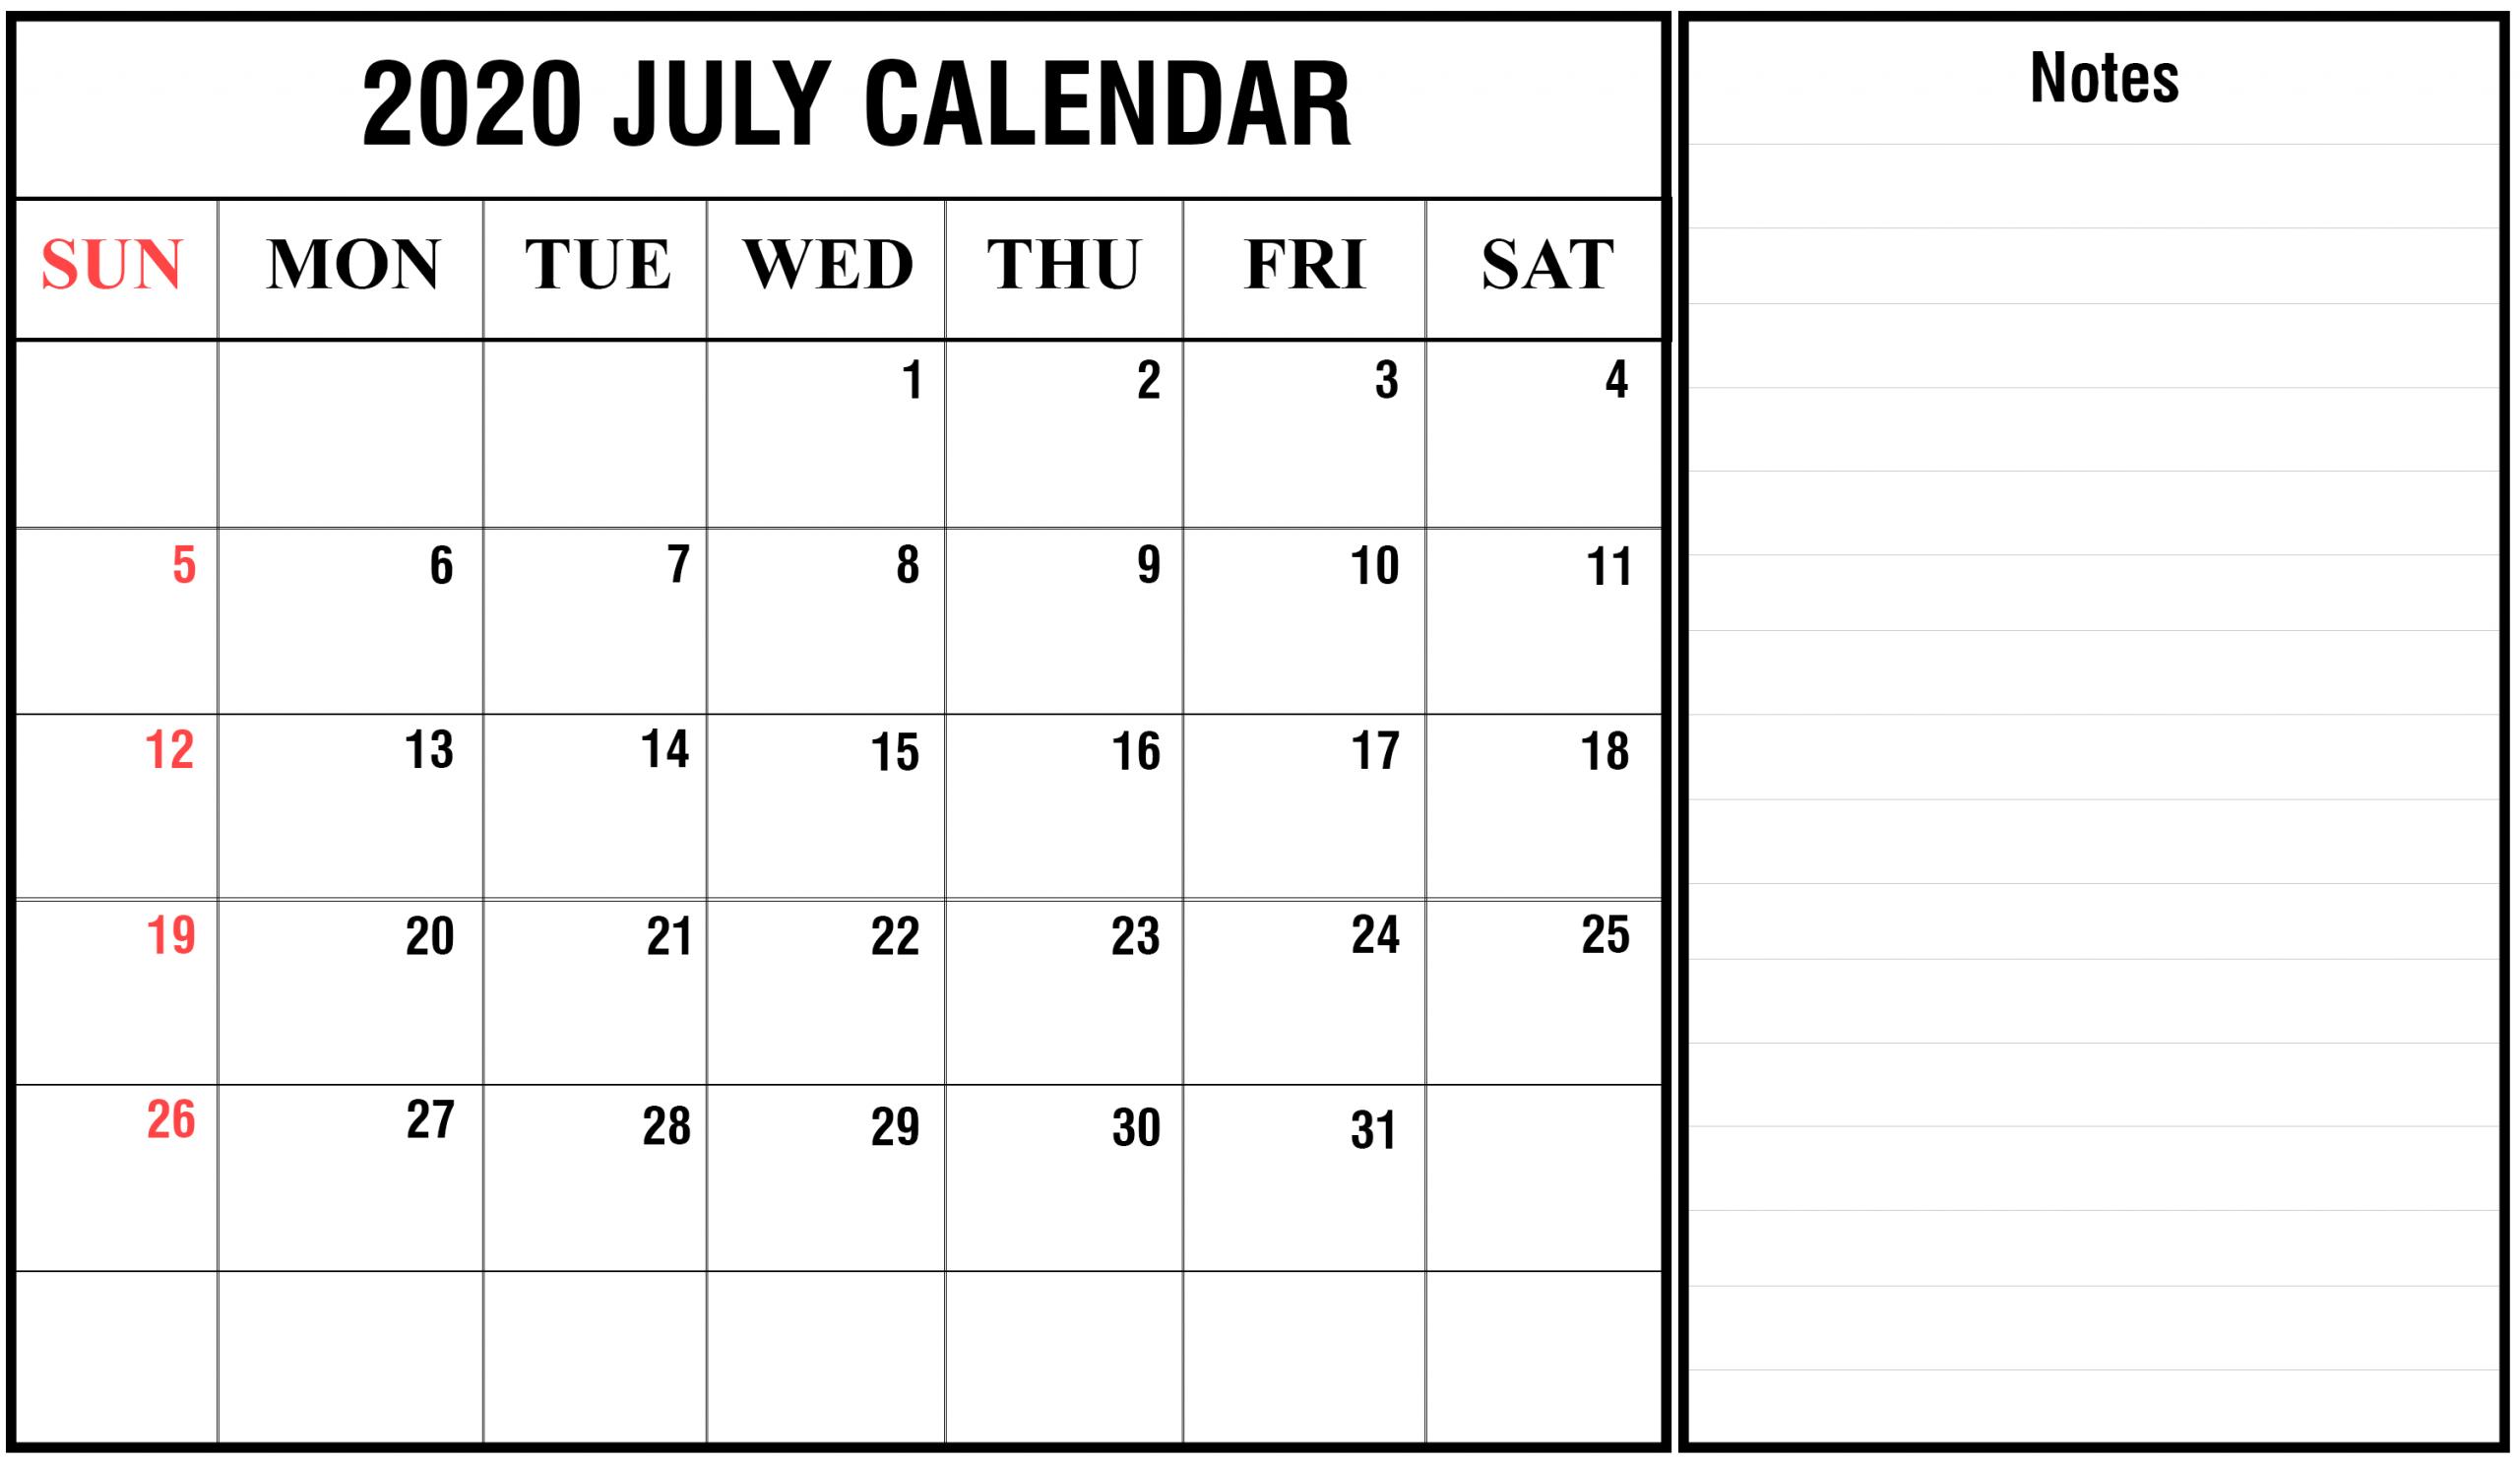 2020 July Calendar – Free Printable Template Download